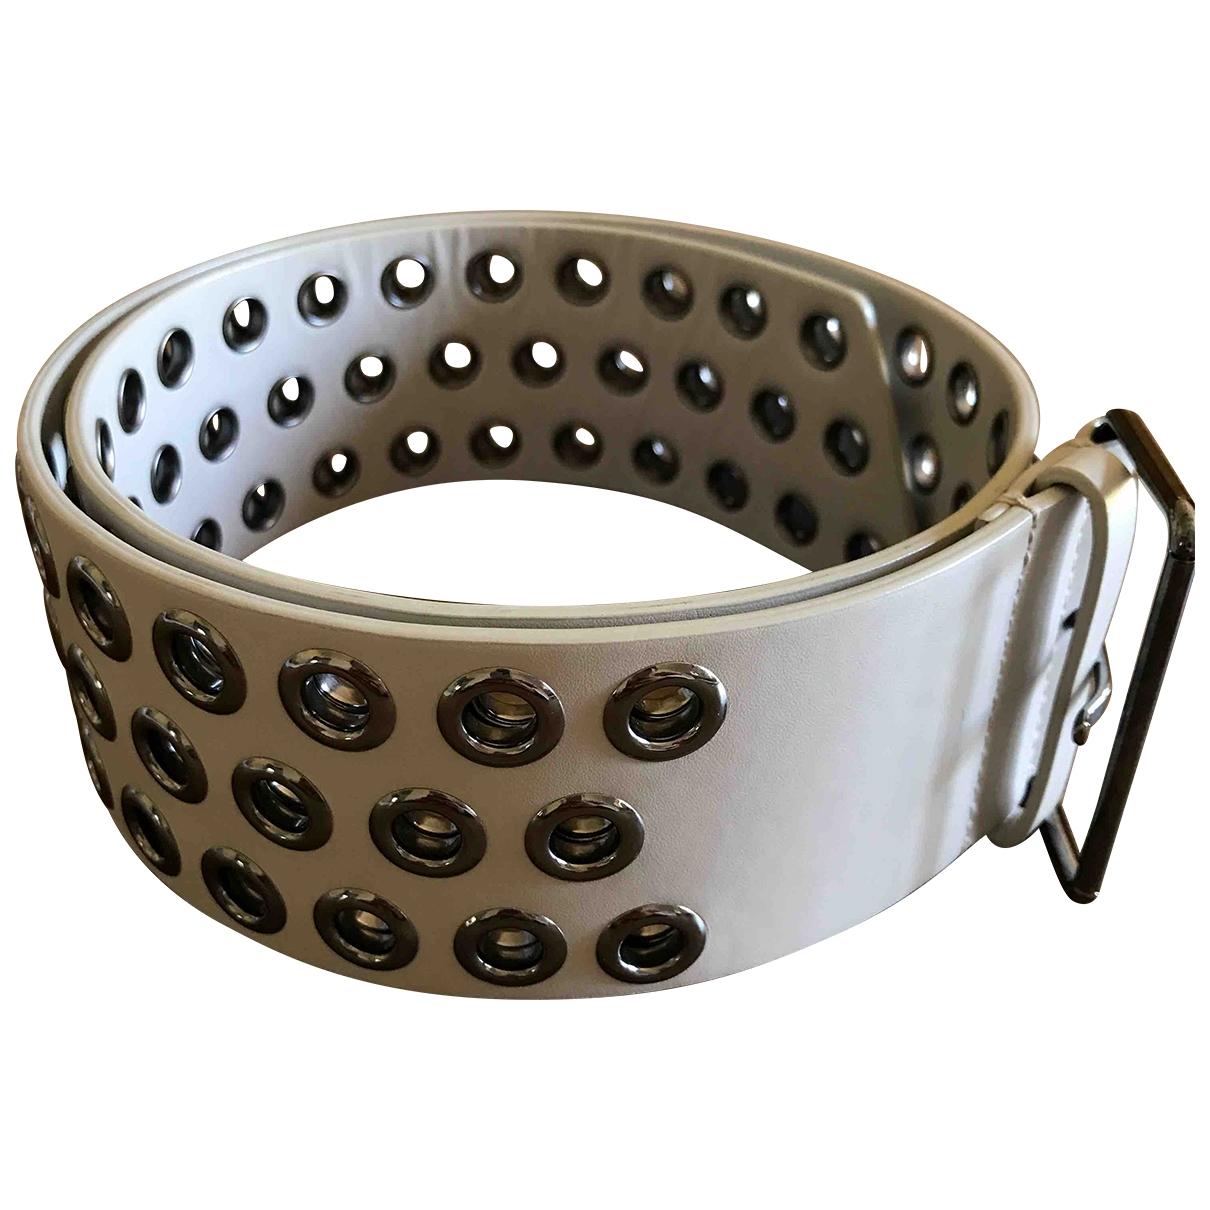 Alaïa \N Ecru Leather belt for Women S International